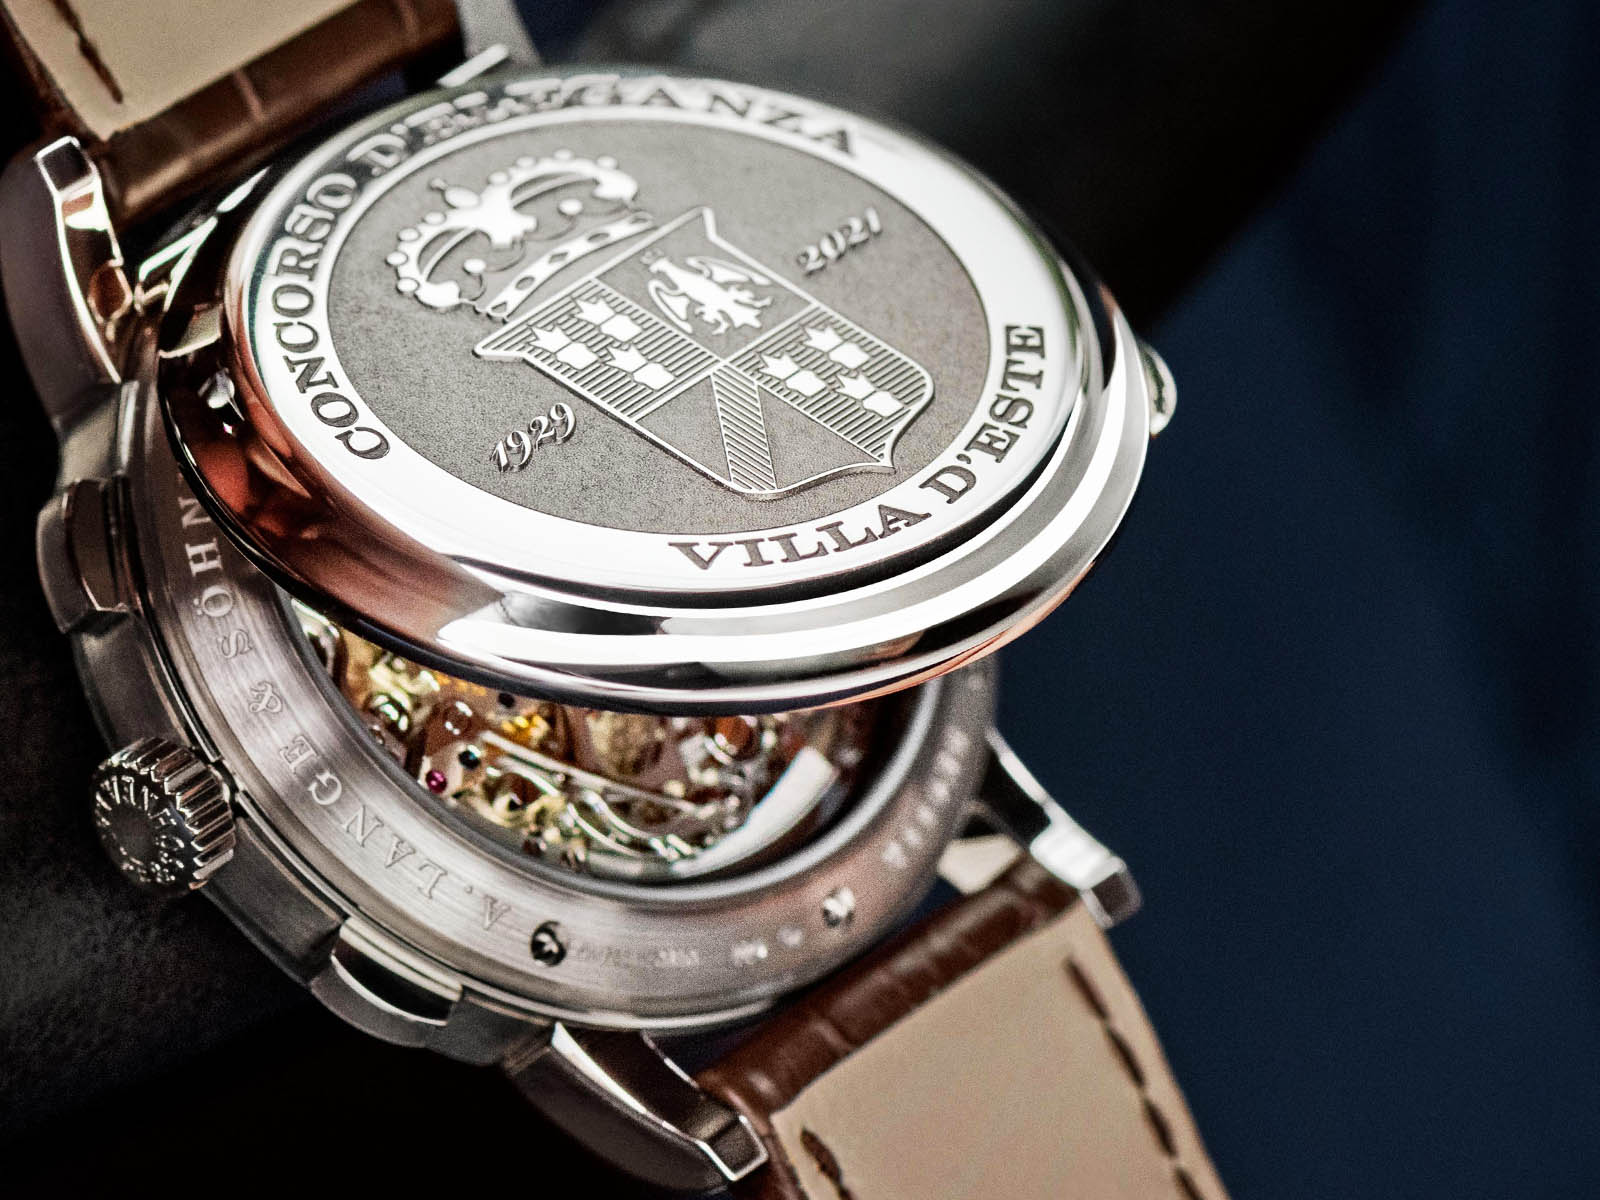 414-049-a-lange-sohne-1815-chronograph-2021-concorso-edition-8.jpg